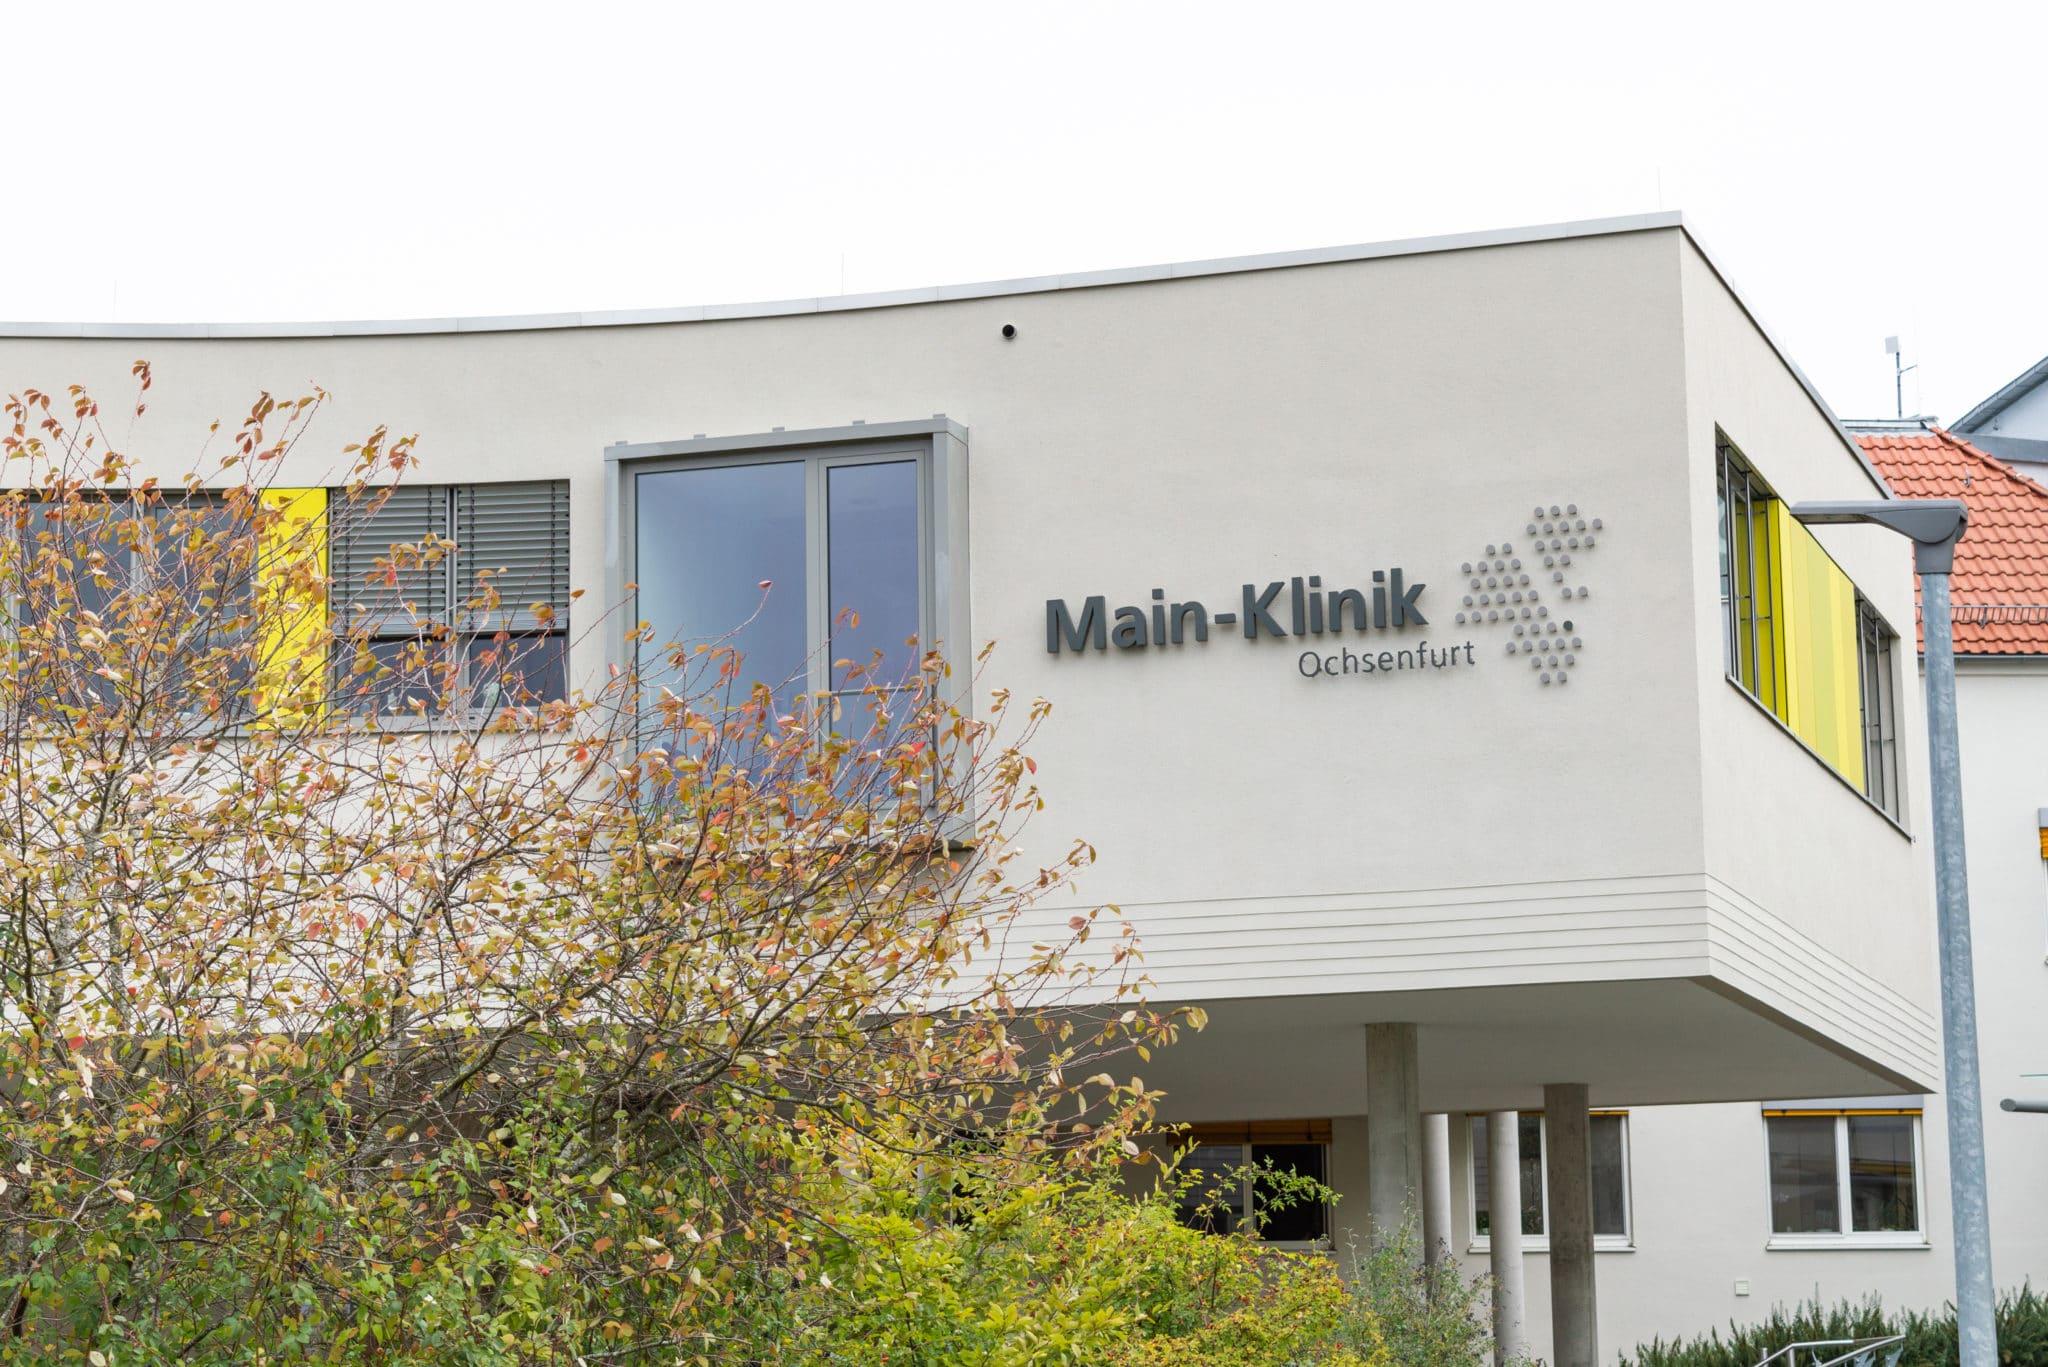 03Mainklinik_intensivpflege_5